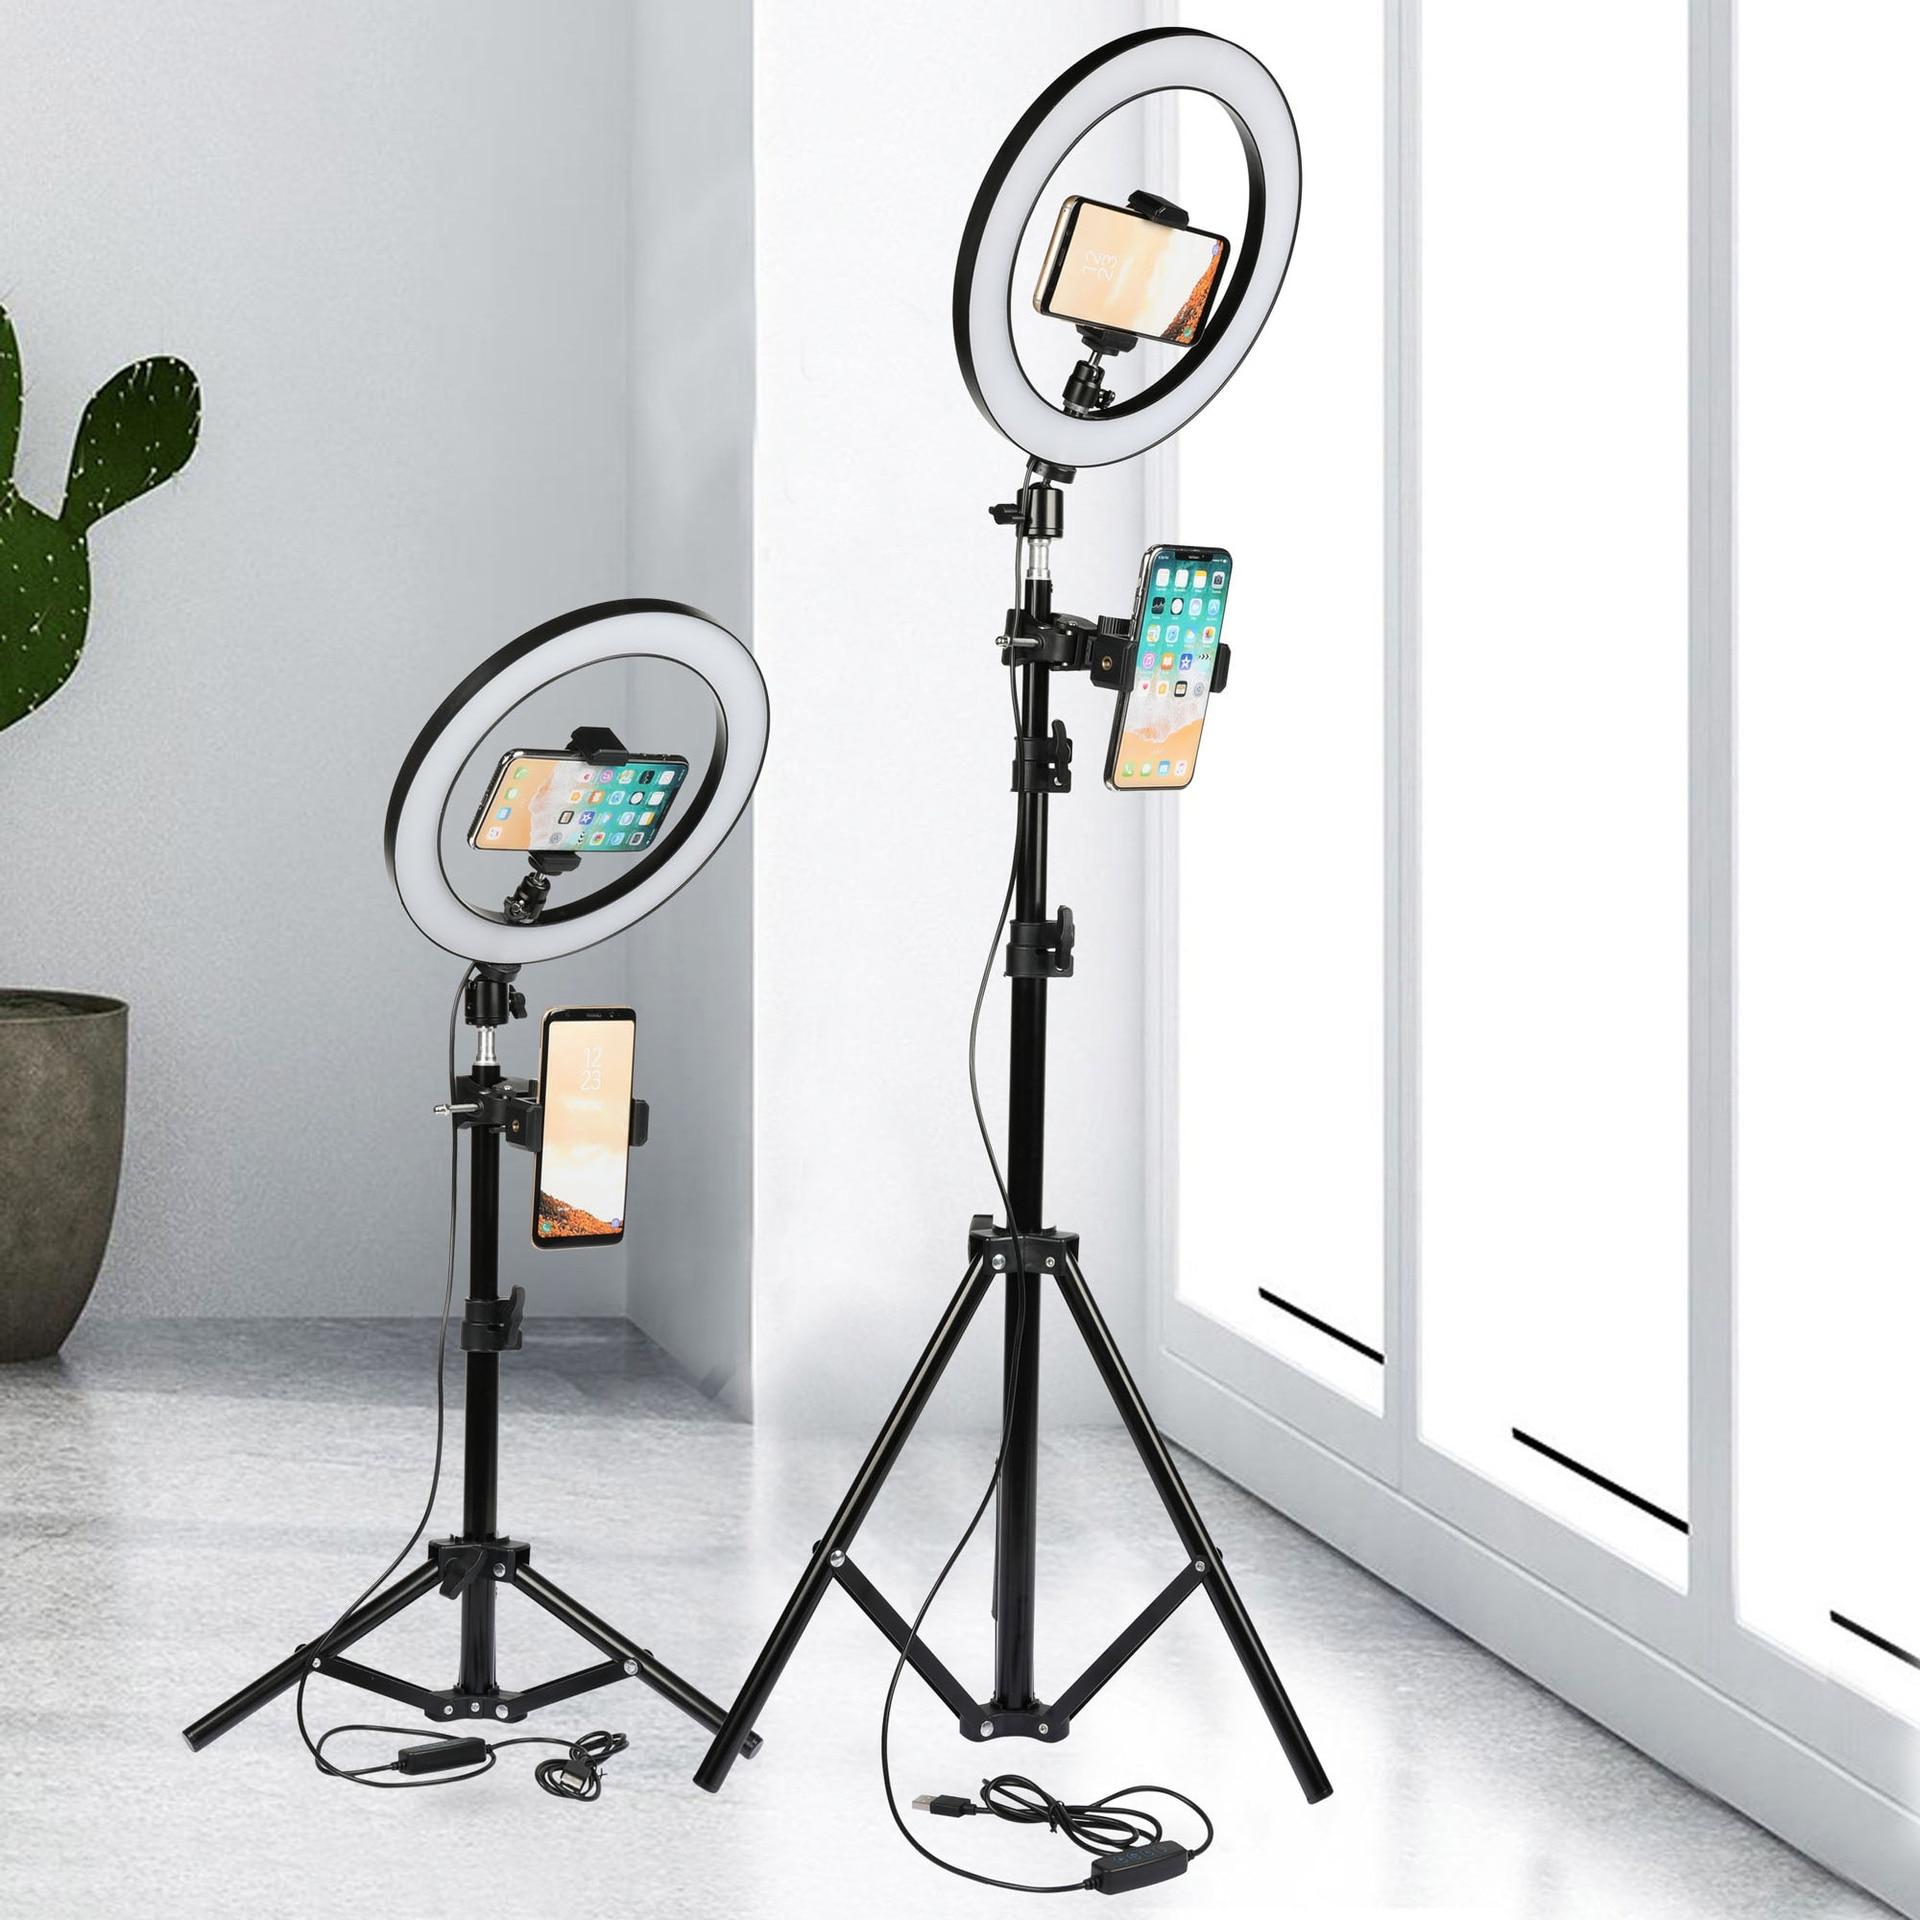 26CM LED Selfie Ring Light Multi-Function Dimmable Ring Light For Cell Phone Holder Camera Live Video Stream Makeup Youtube